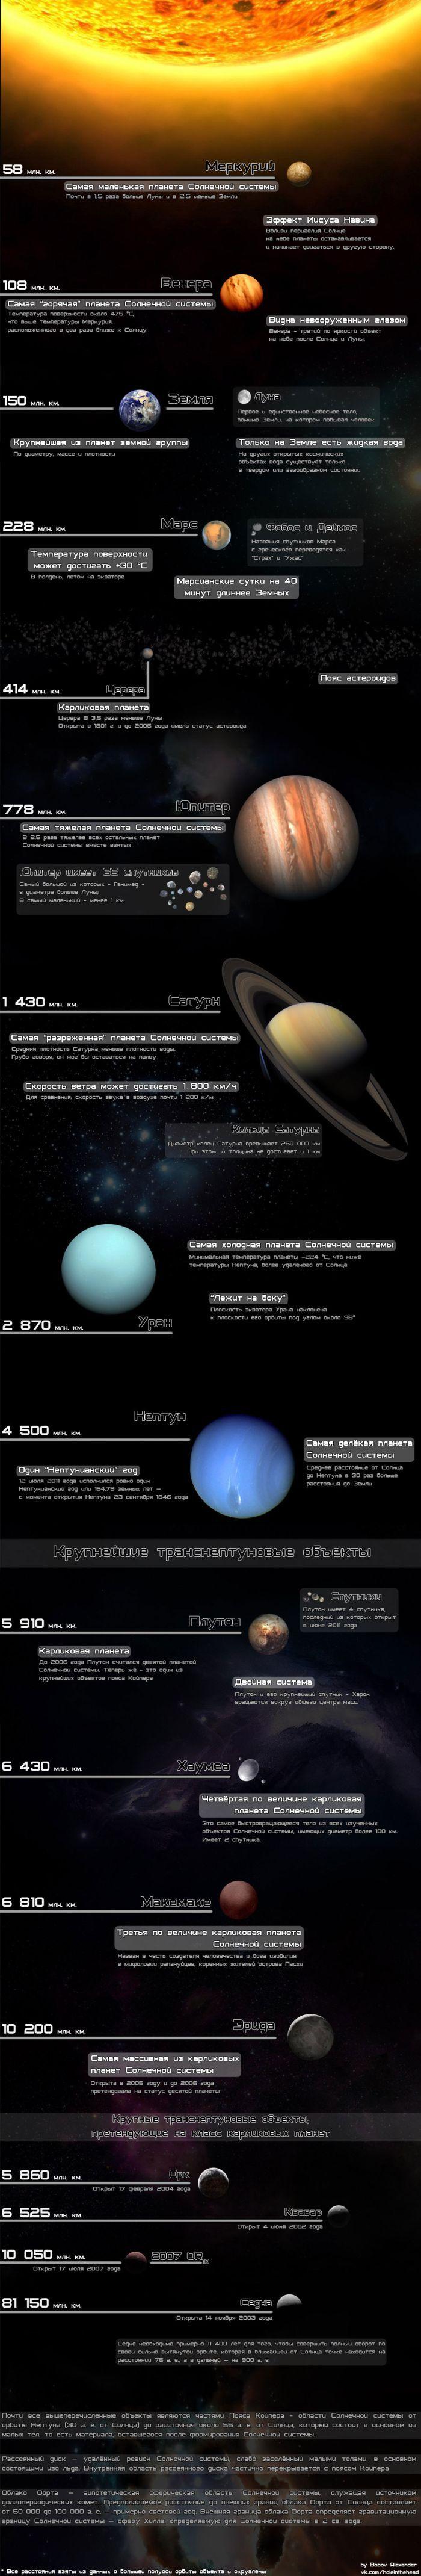 Про солнечную систему (1 картинка)